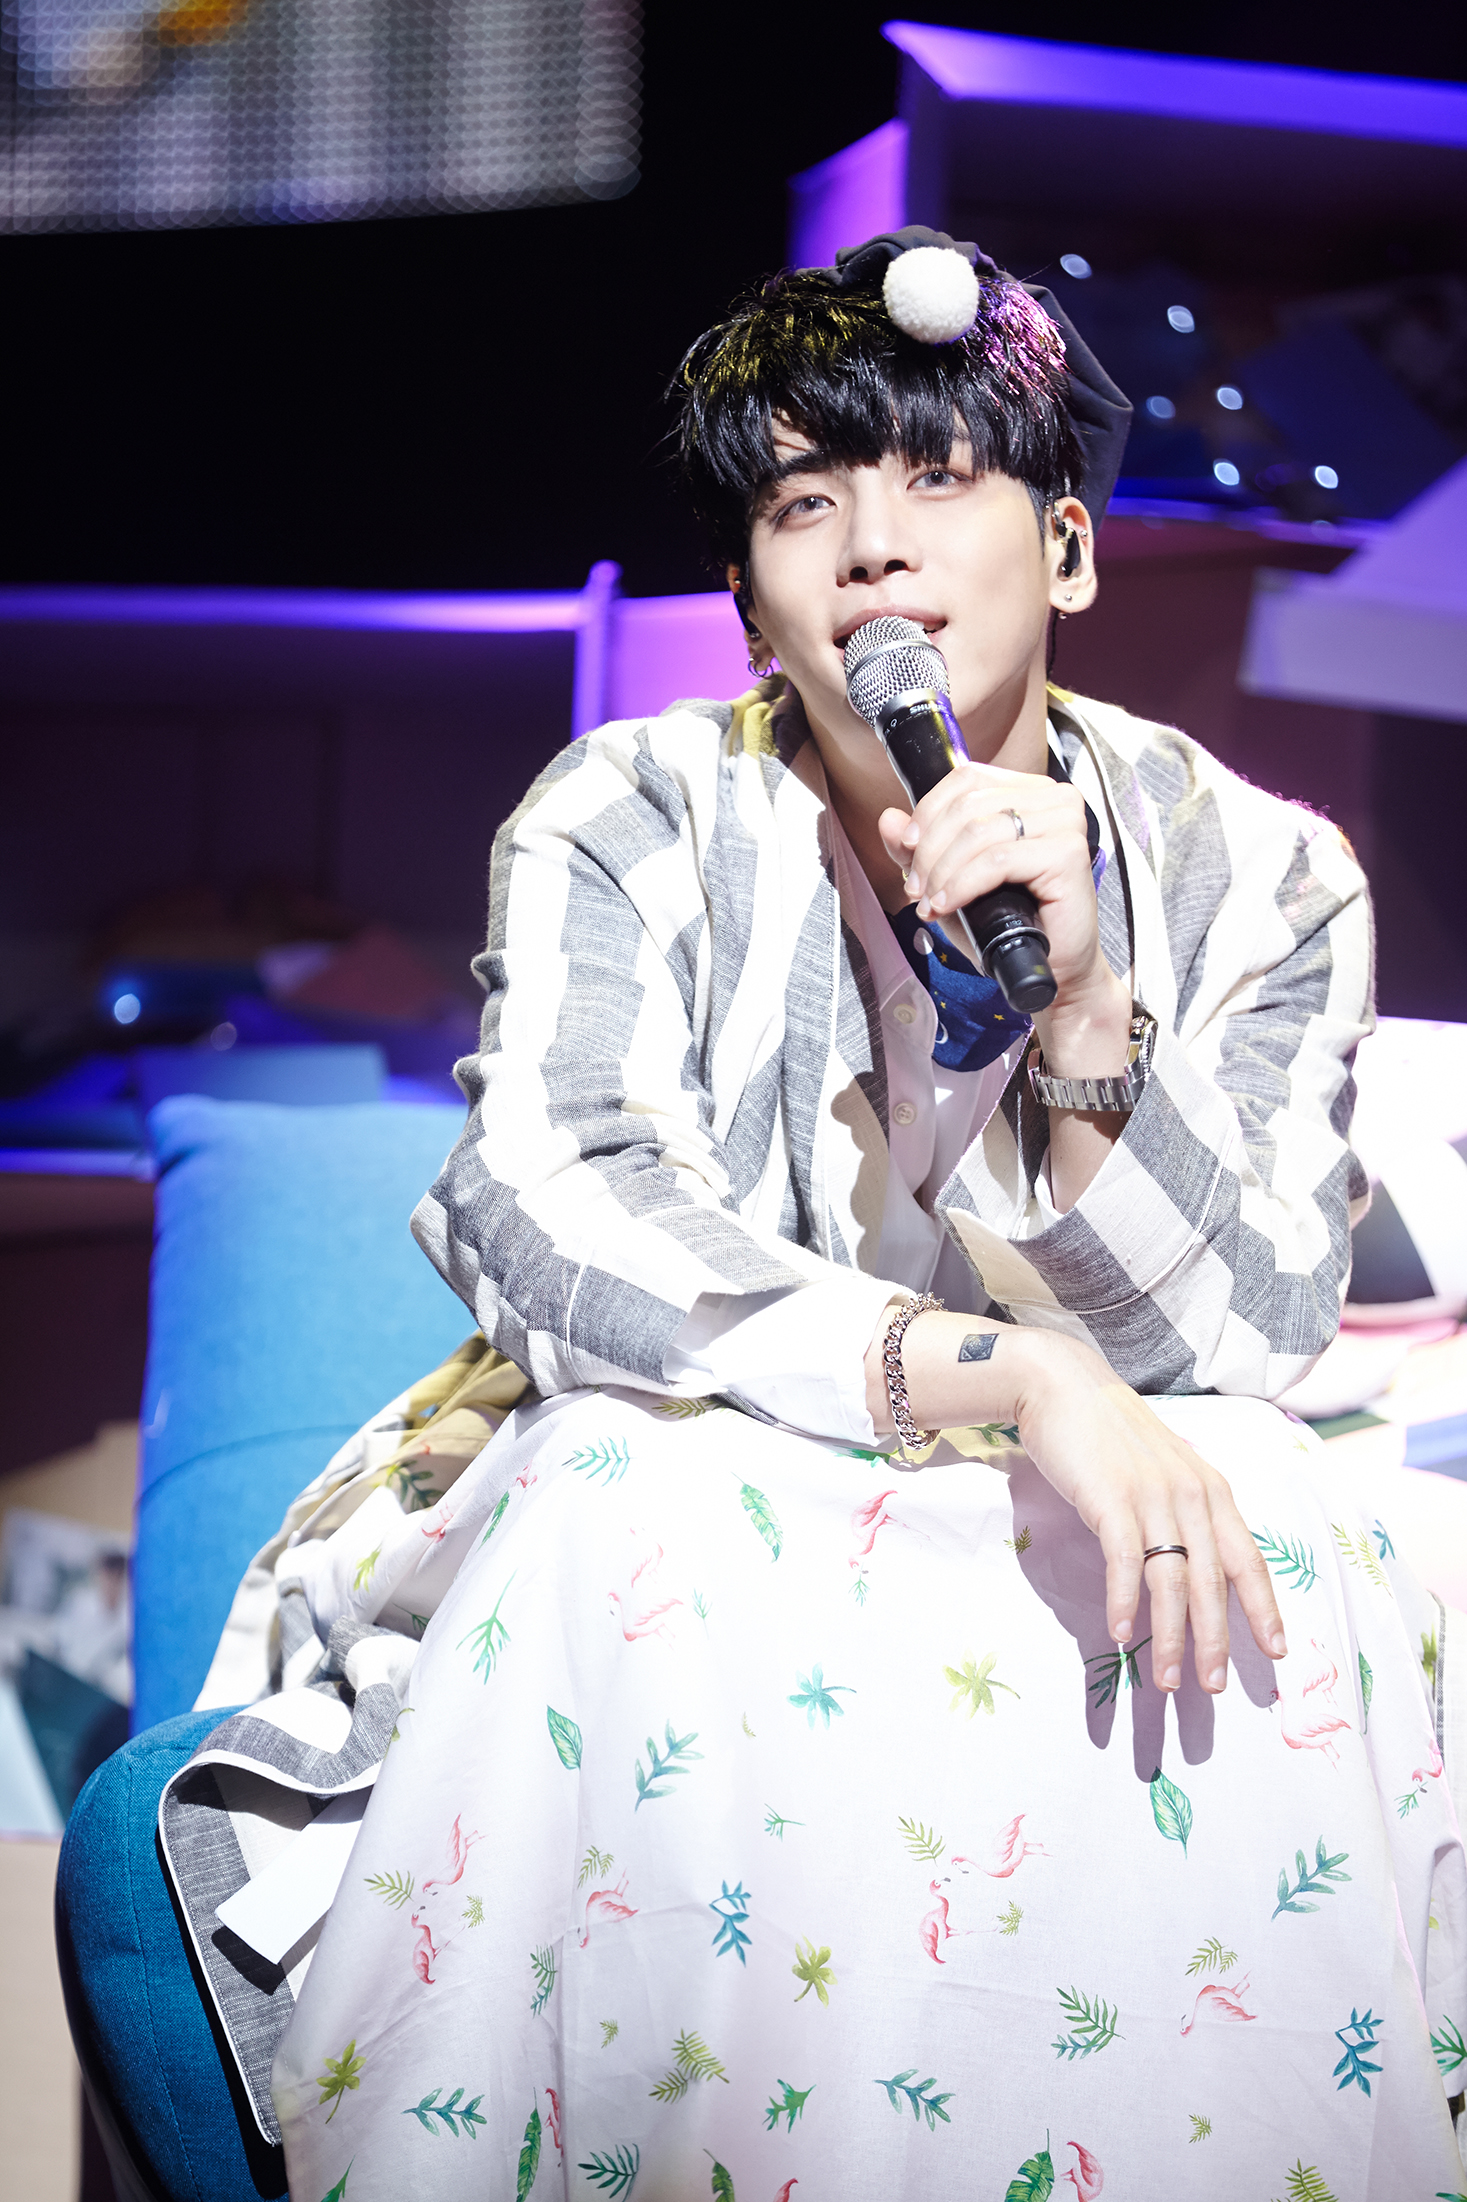 jonghyun concert 2017